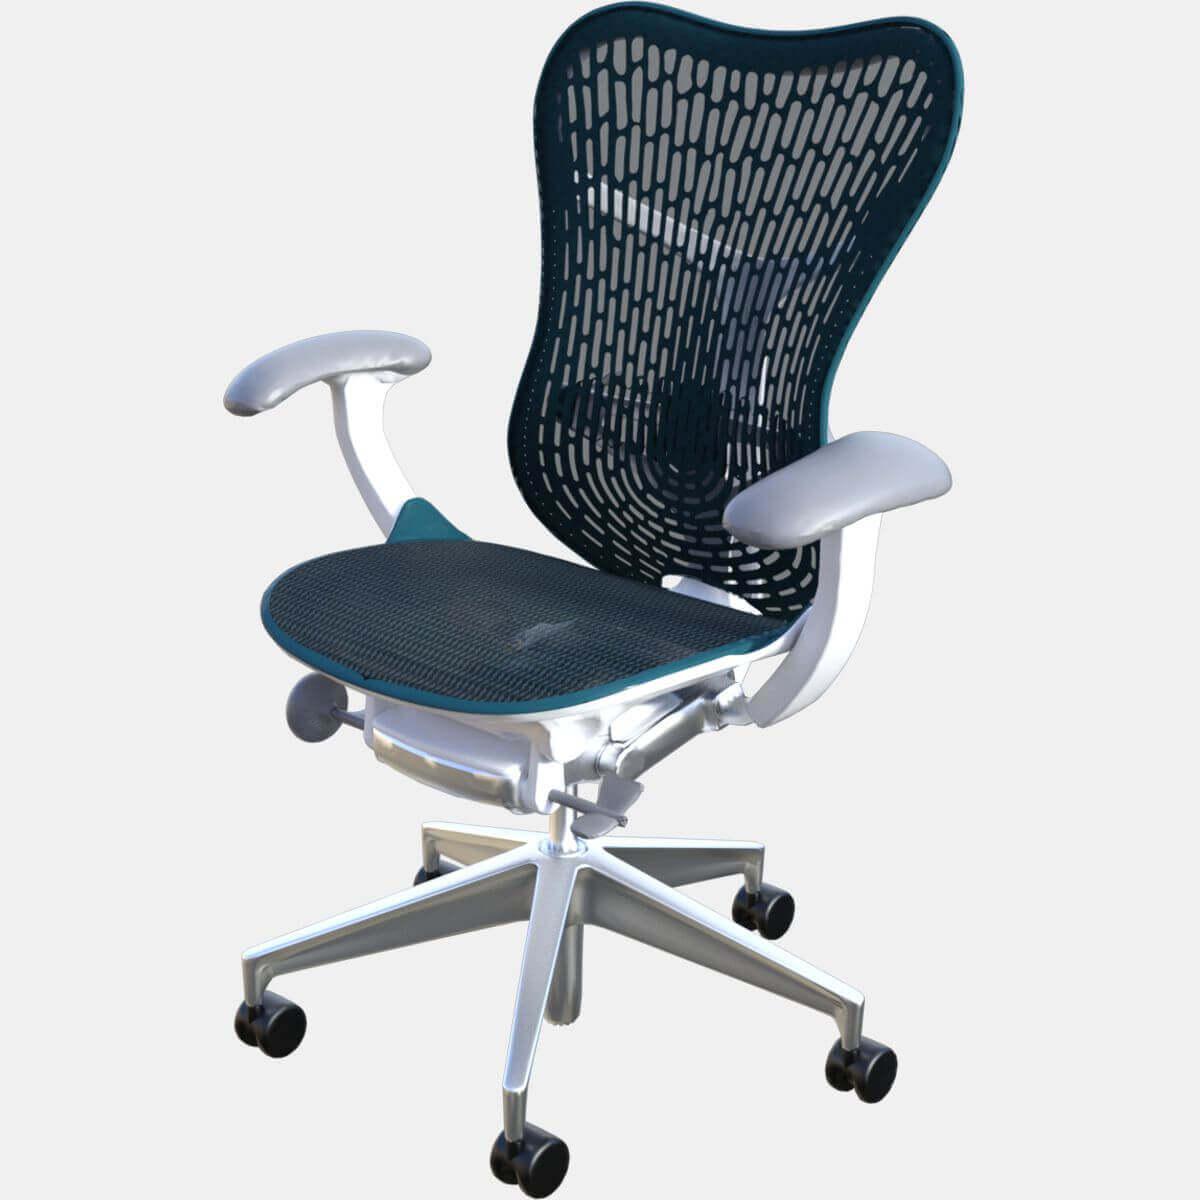 mirra 2 chair over tables elderly herman miller free 3d model